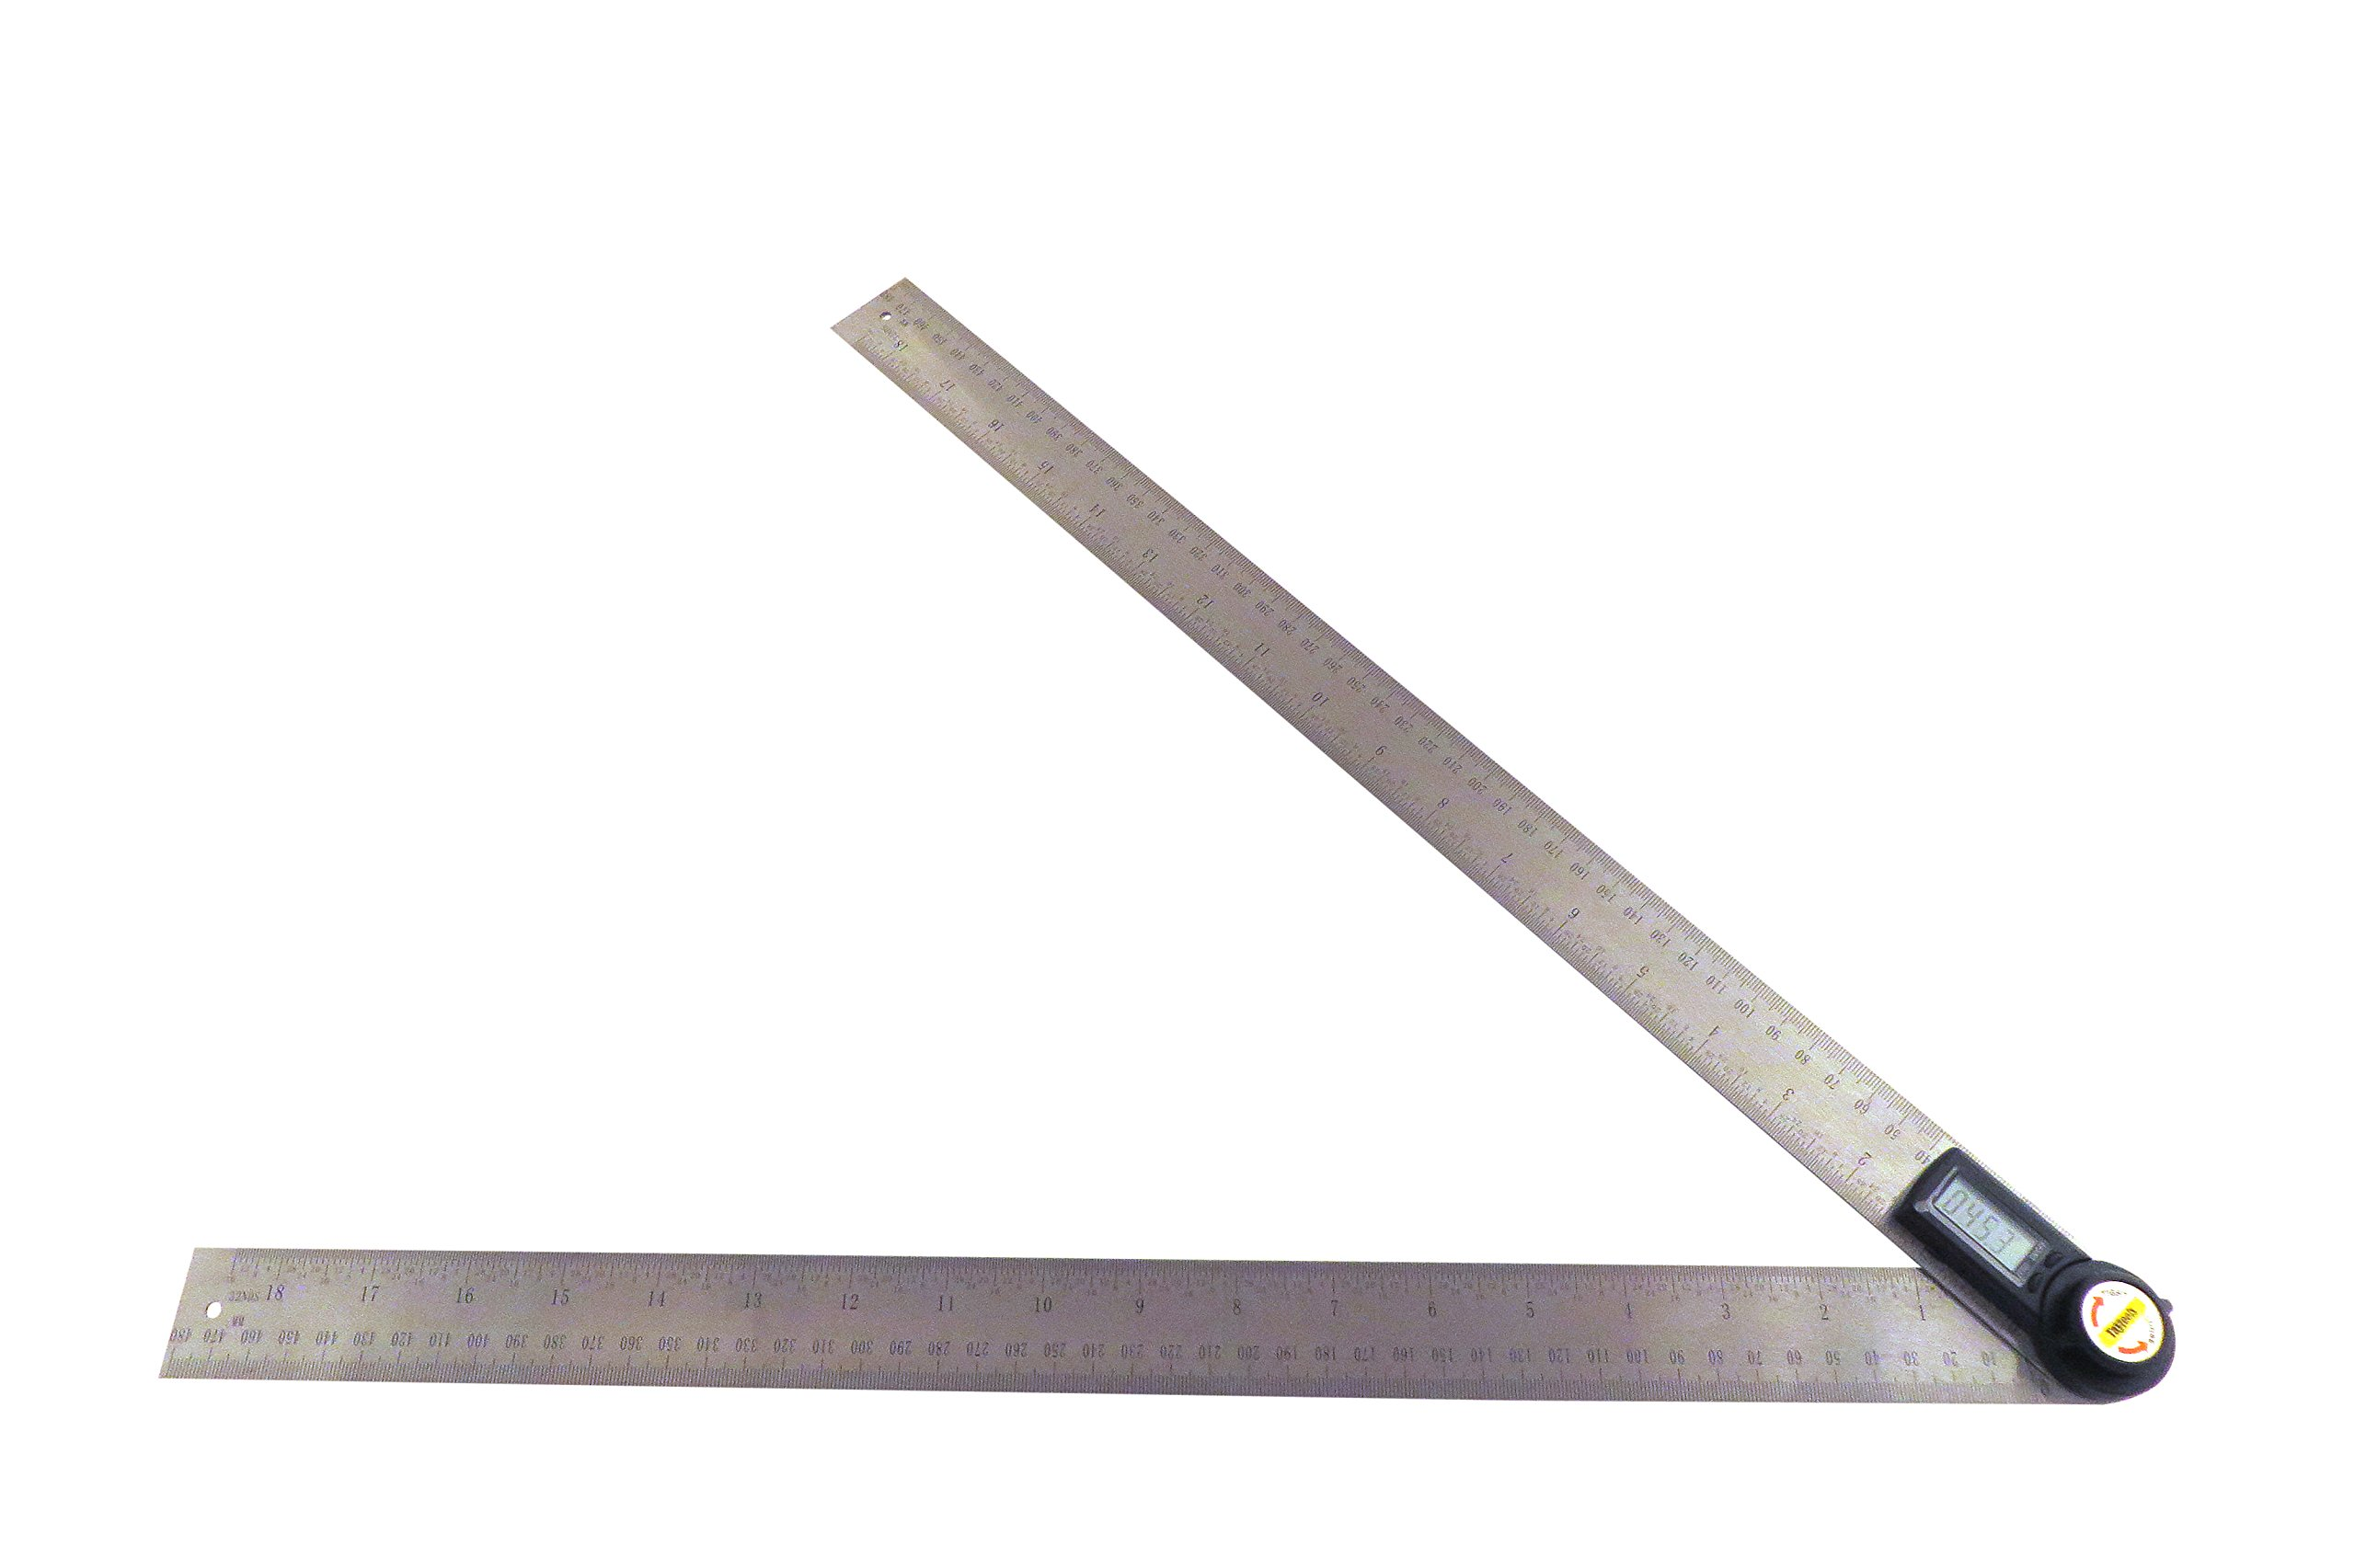 Taytools 500 mm 20'' 2 in 1 Digital Protractor Digital Goniometer Digital Angle Finder Ruler with Stainless Steel Blades 114115